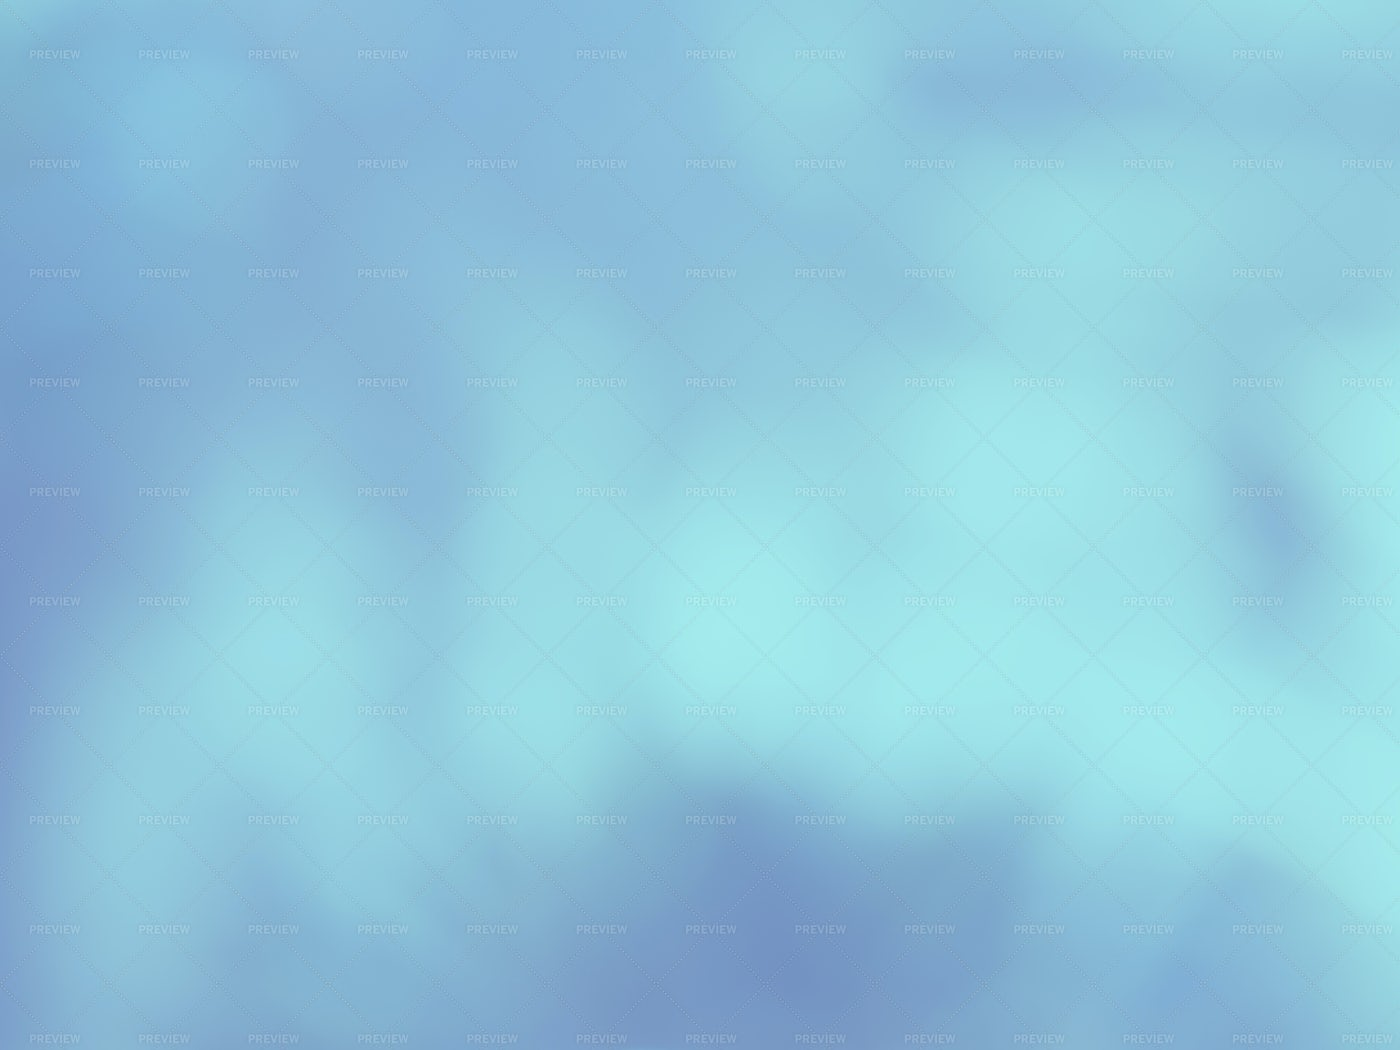 Abstract Metallic Blue Background: Stock Photos